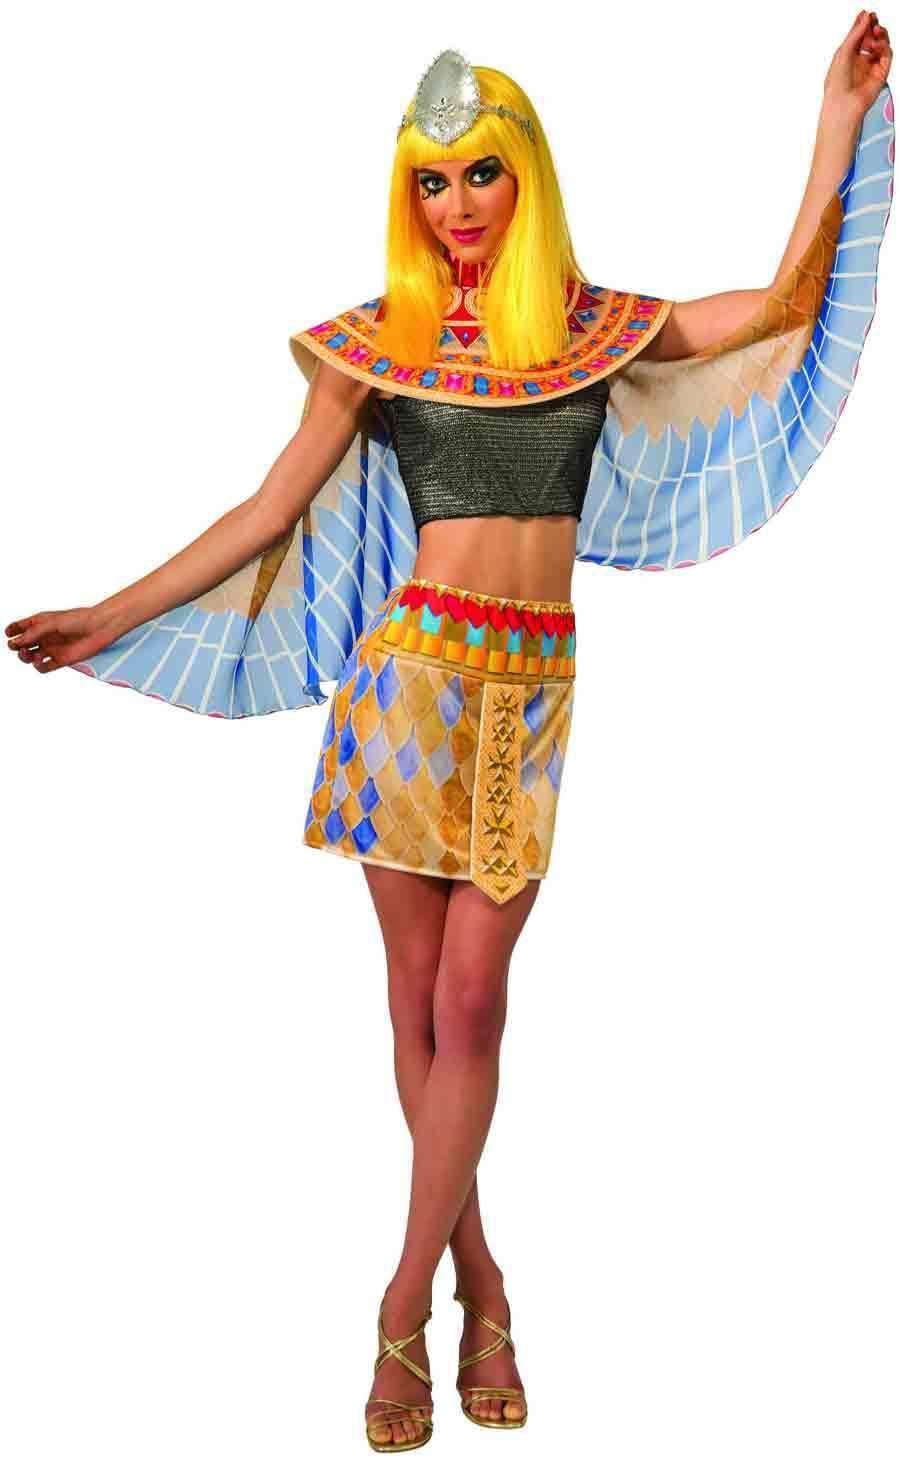 638c17ac50 Licensed Katy Perry Dark Horse Rock Star Diva Costume Adult Patra Singer  Egypt - Women